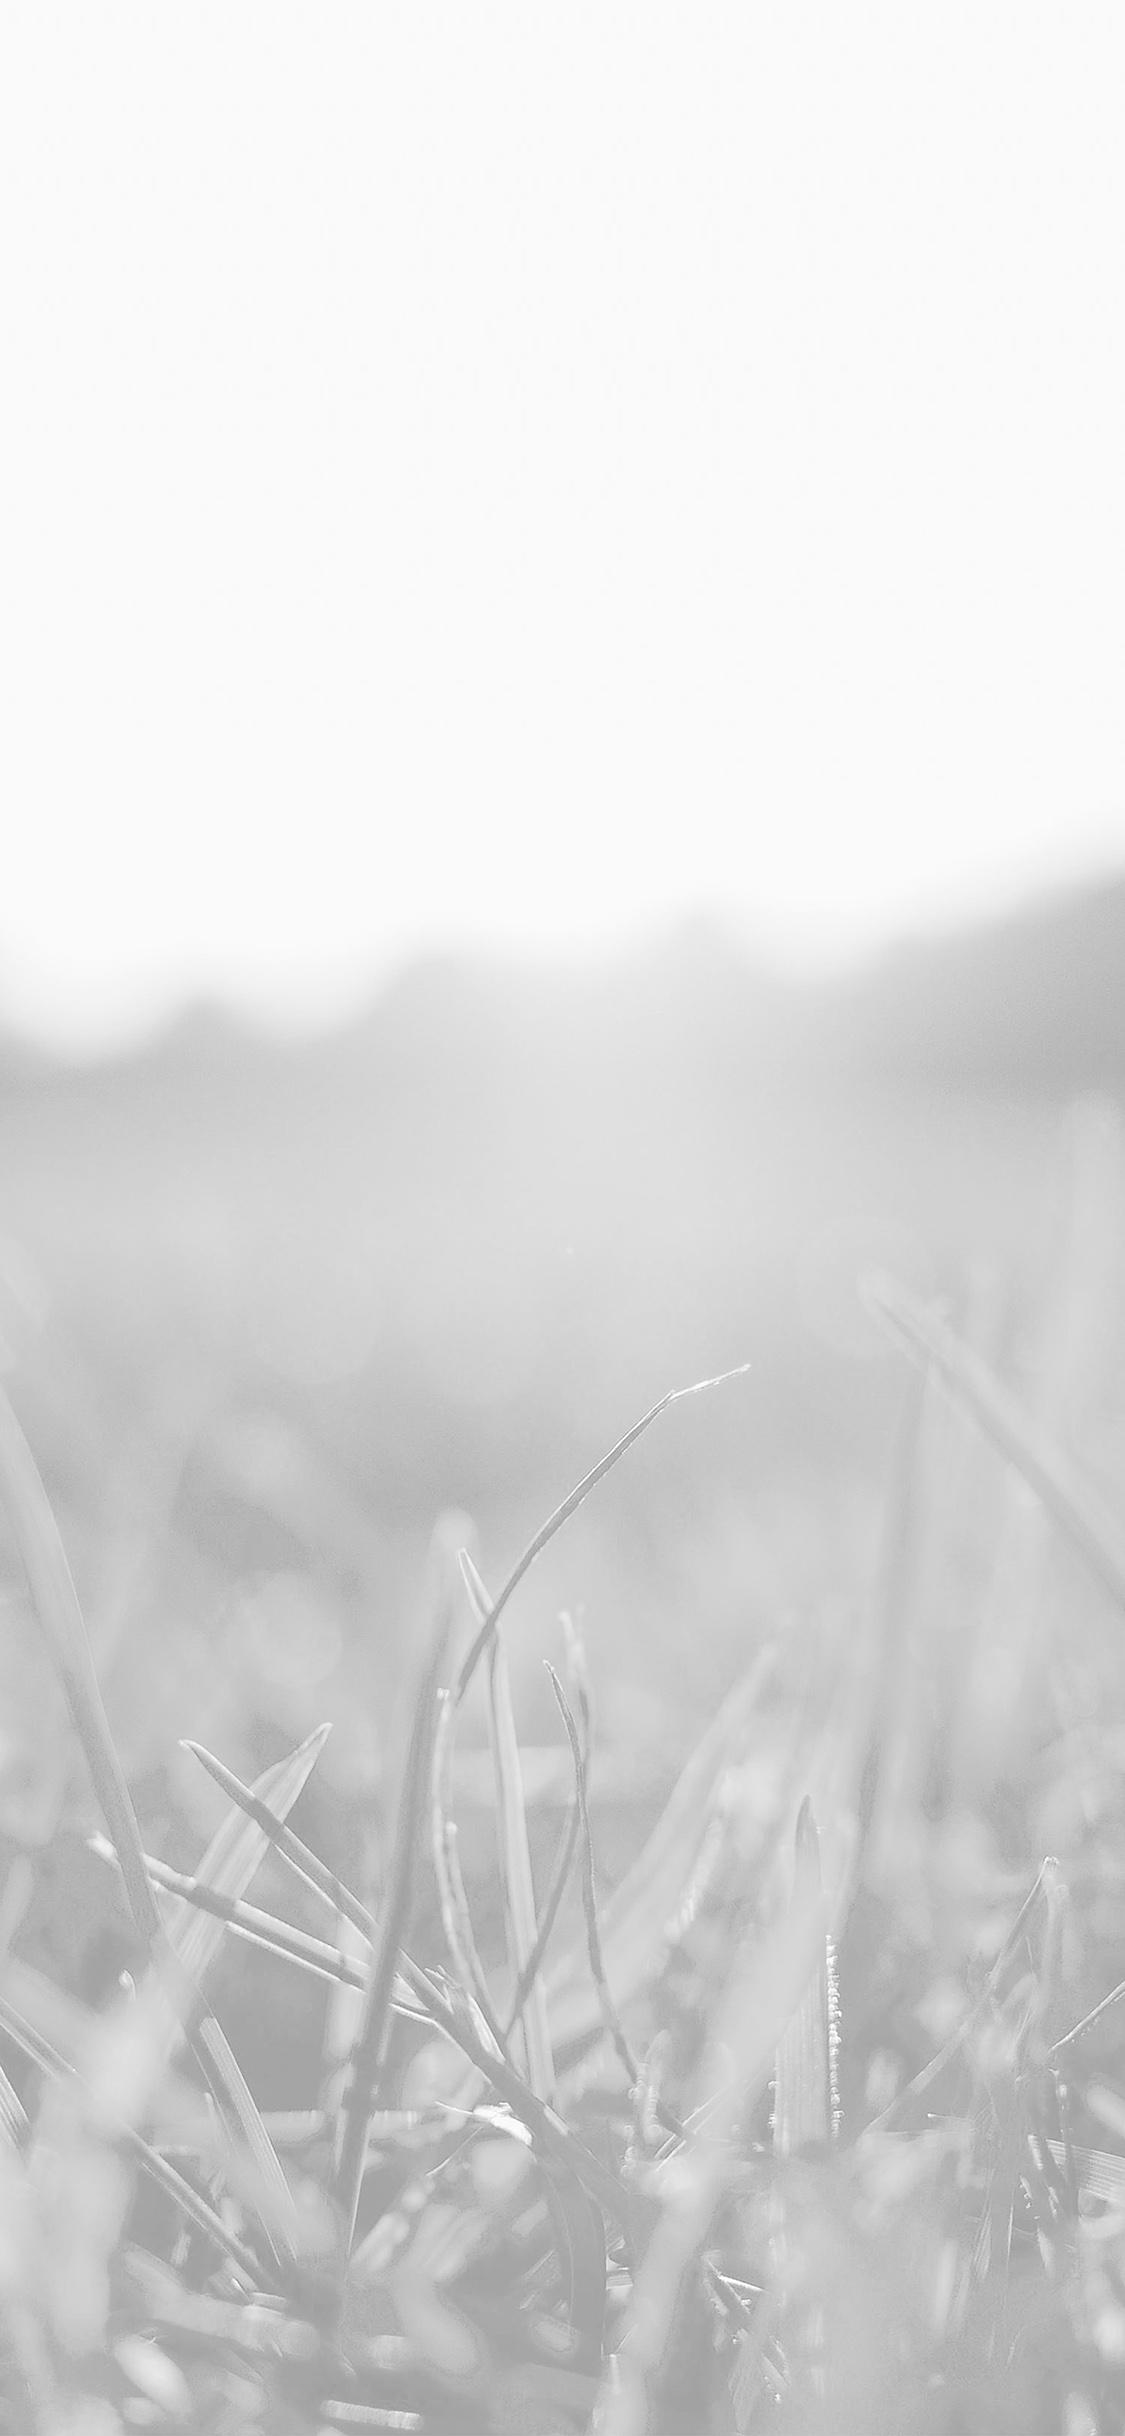 iPhoneXpapers.com-Apple-iPhone-wallpaper-mw49-grass-white-bokeh-light-summer-nature